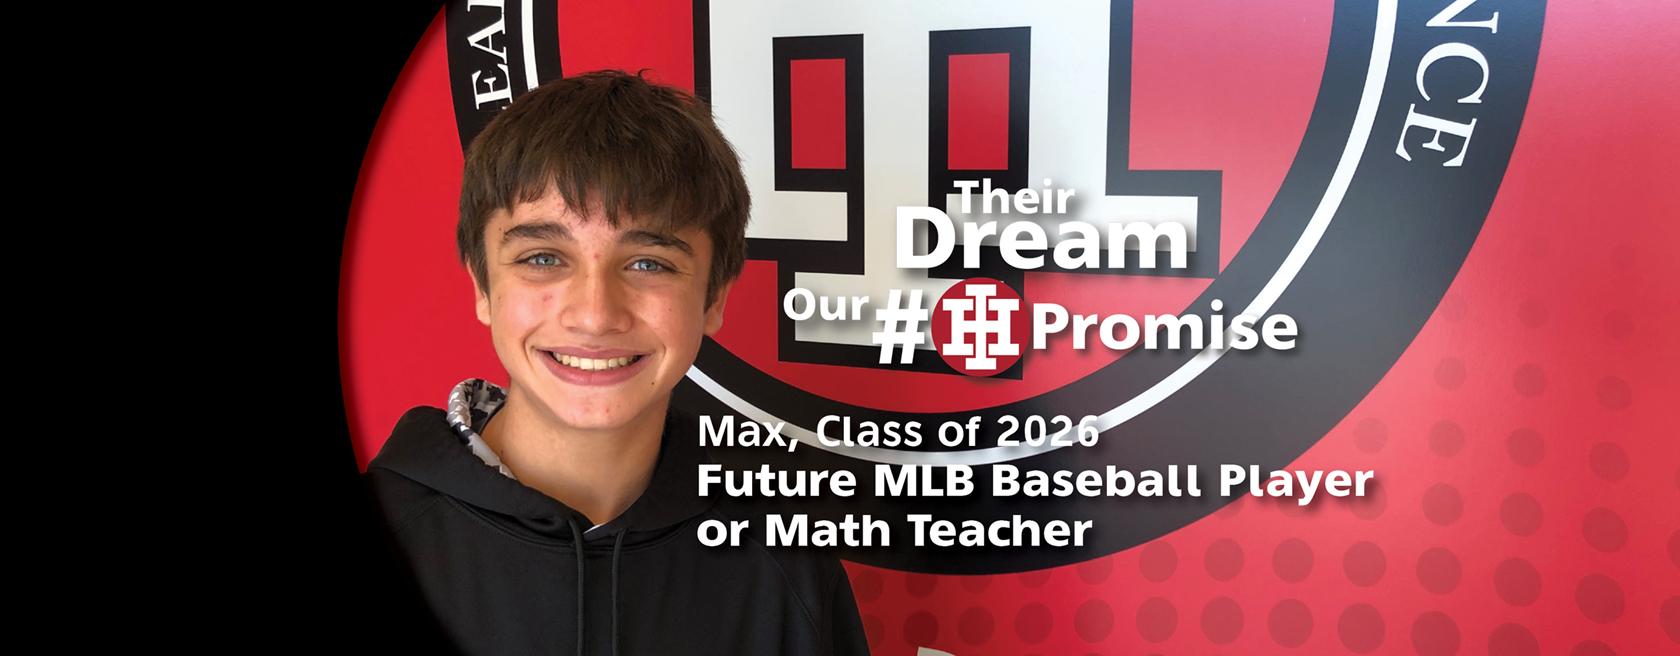 IHMS Student Max